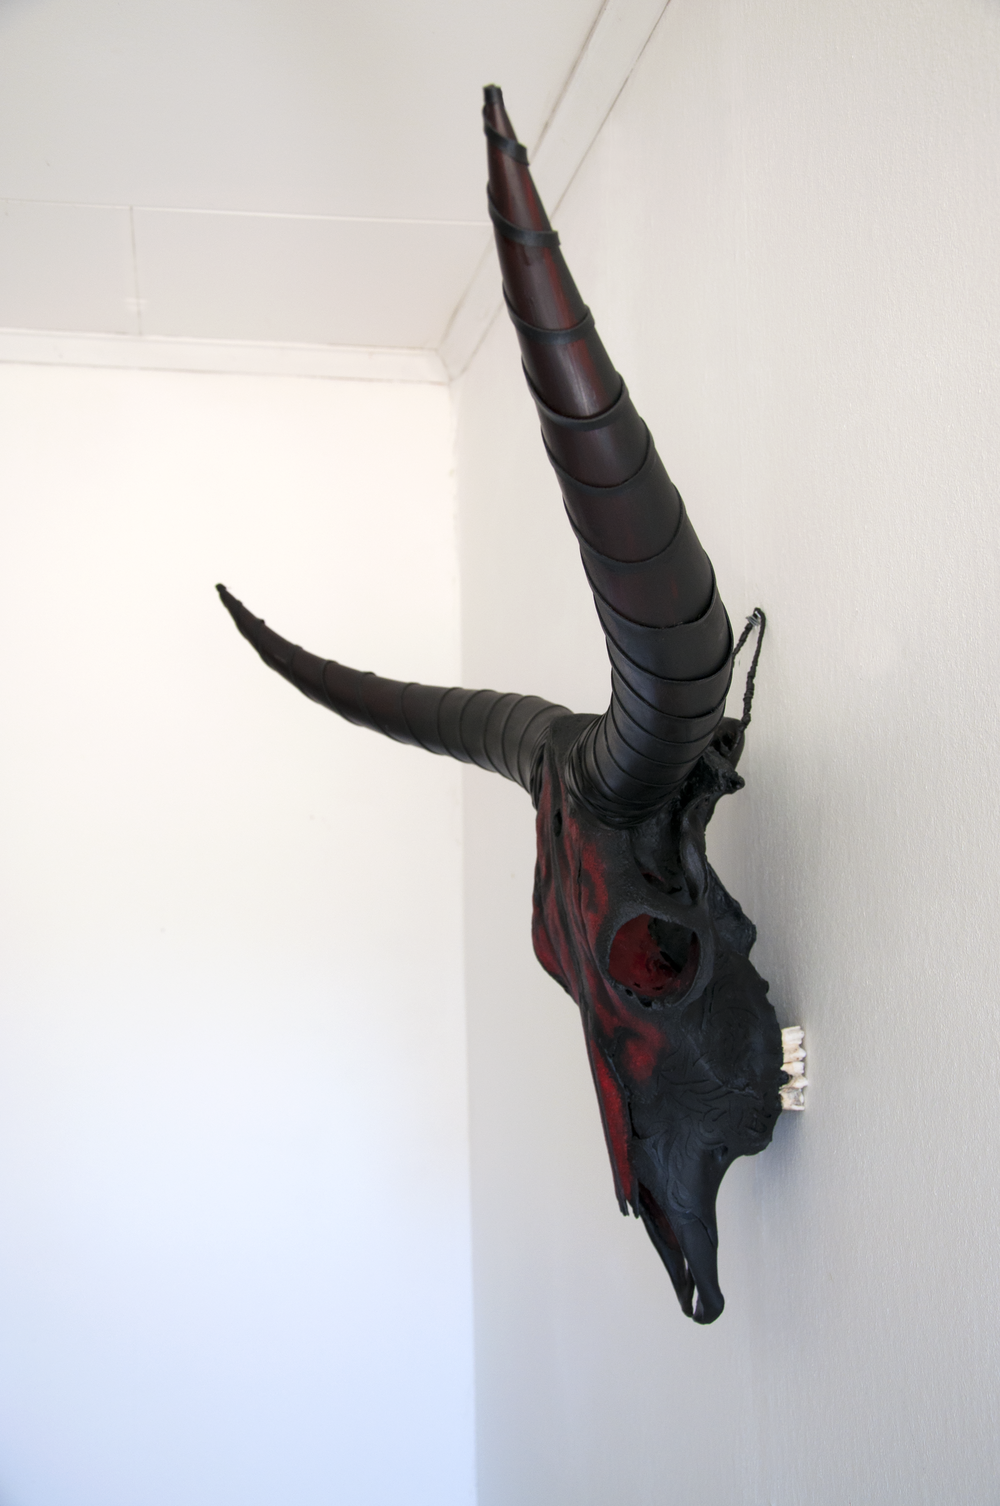 petra-shara-stoor-skull-art-galnakhxor-2.png